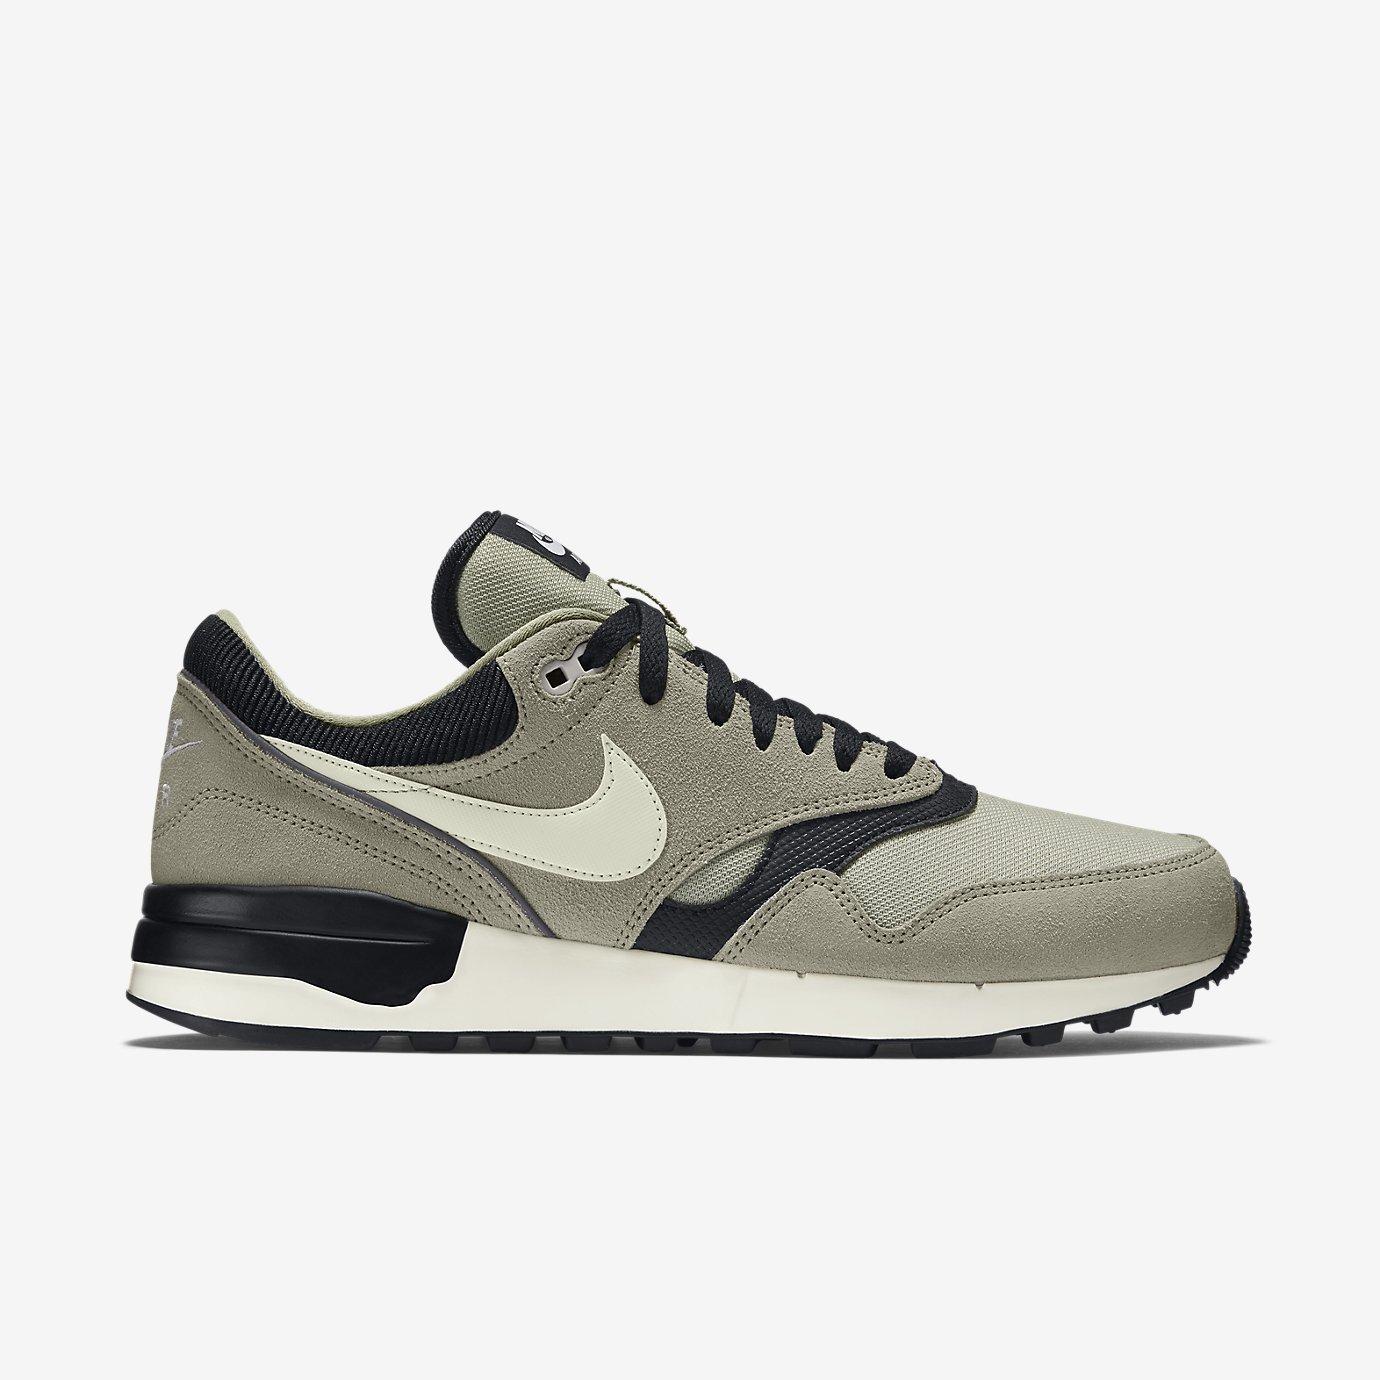 Nike Air Odyssey Herren Sneakers  46 EU Verschiedene Farben (Grau / Schwarz / Wei? (Wolf Grey / Sail-lunar Grey-blk))